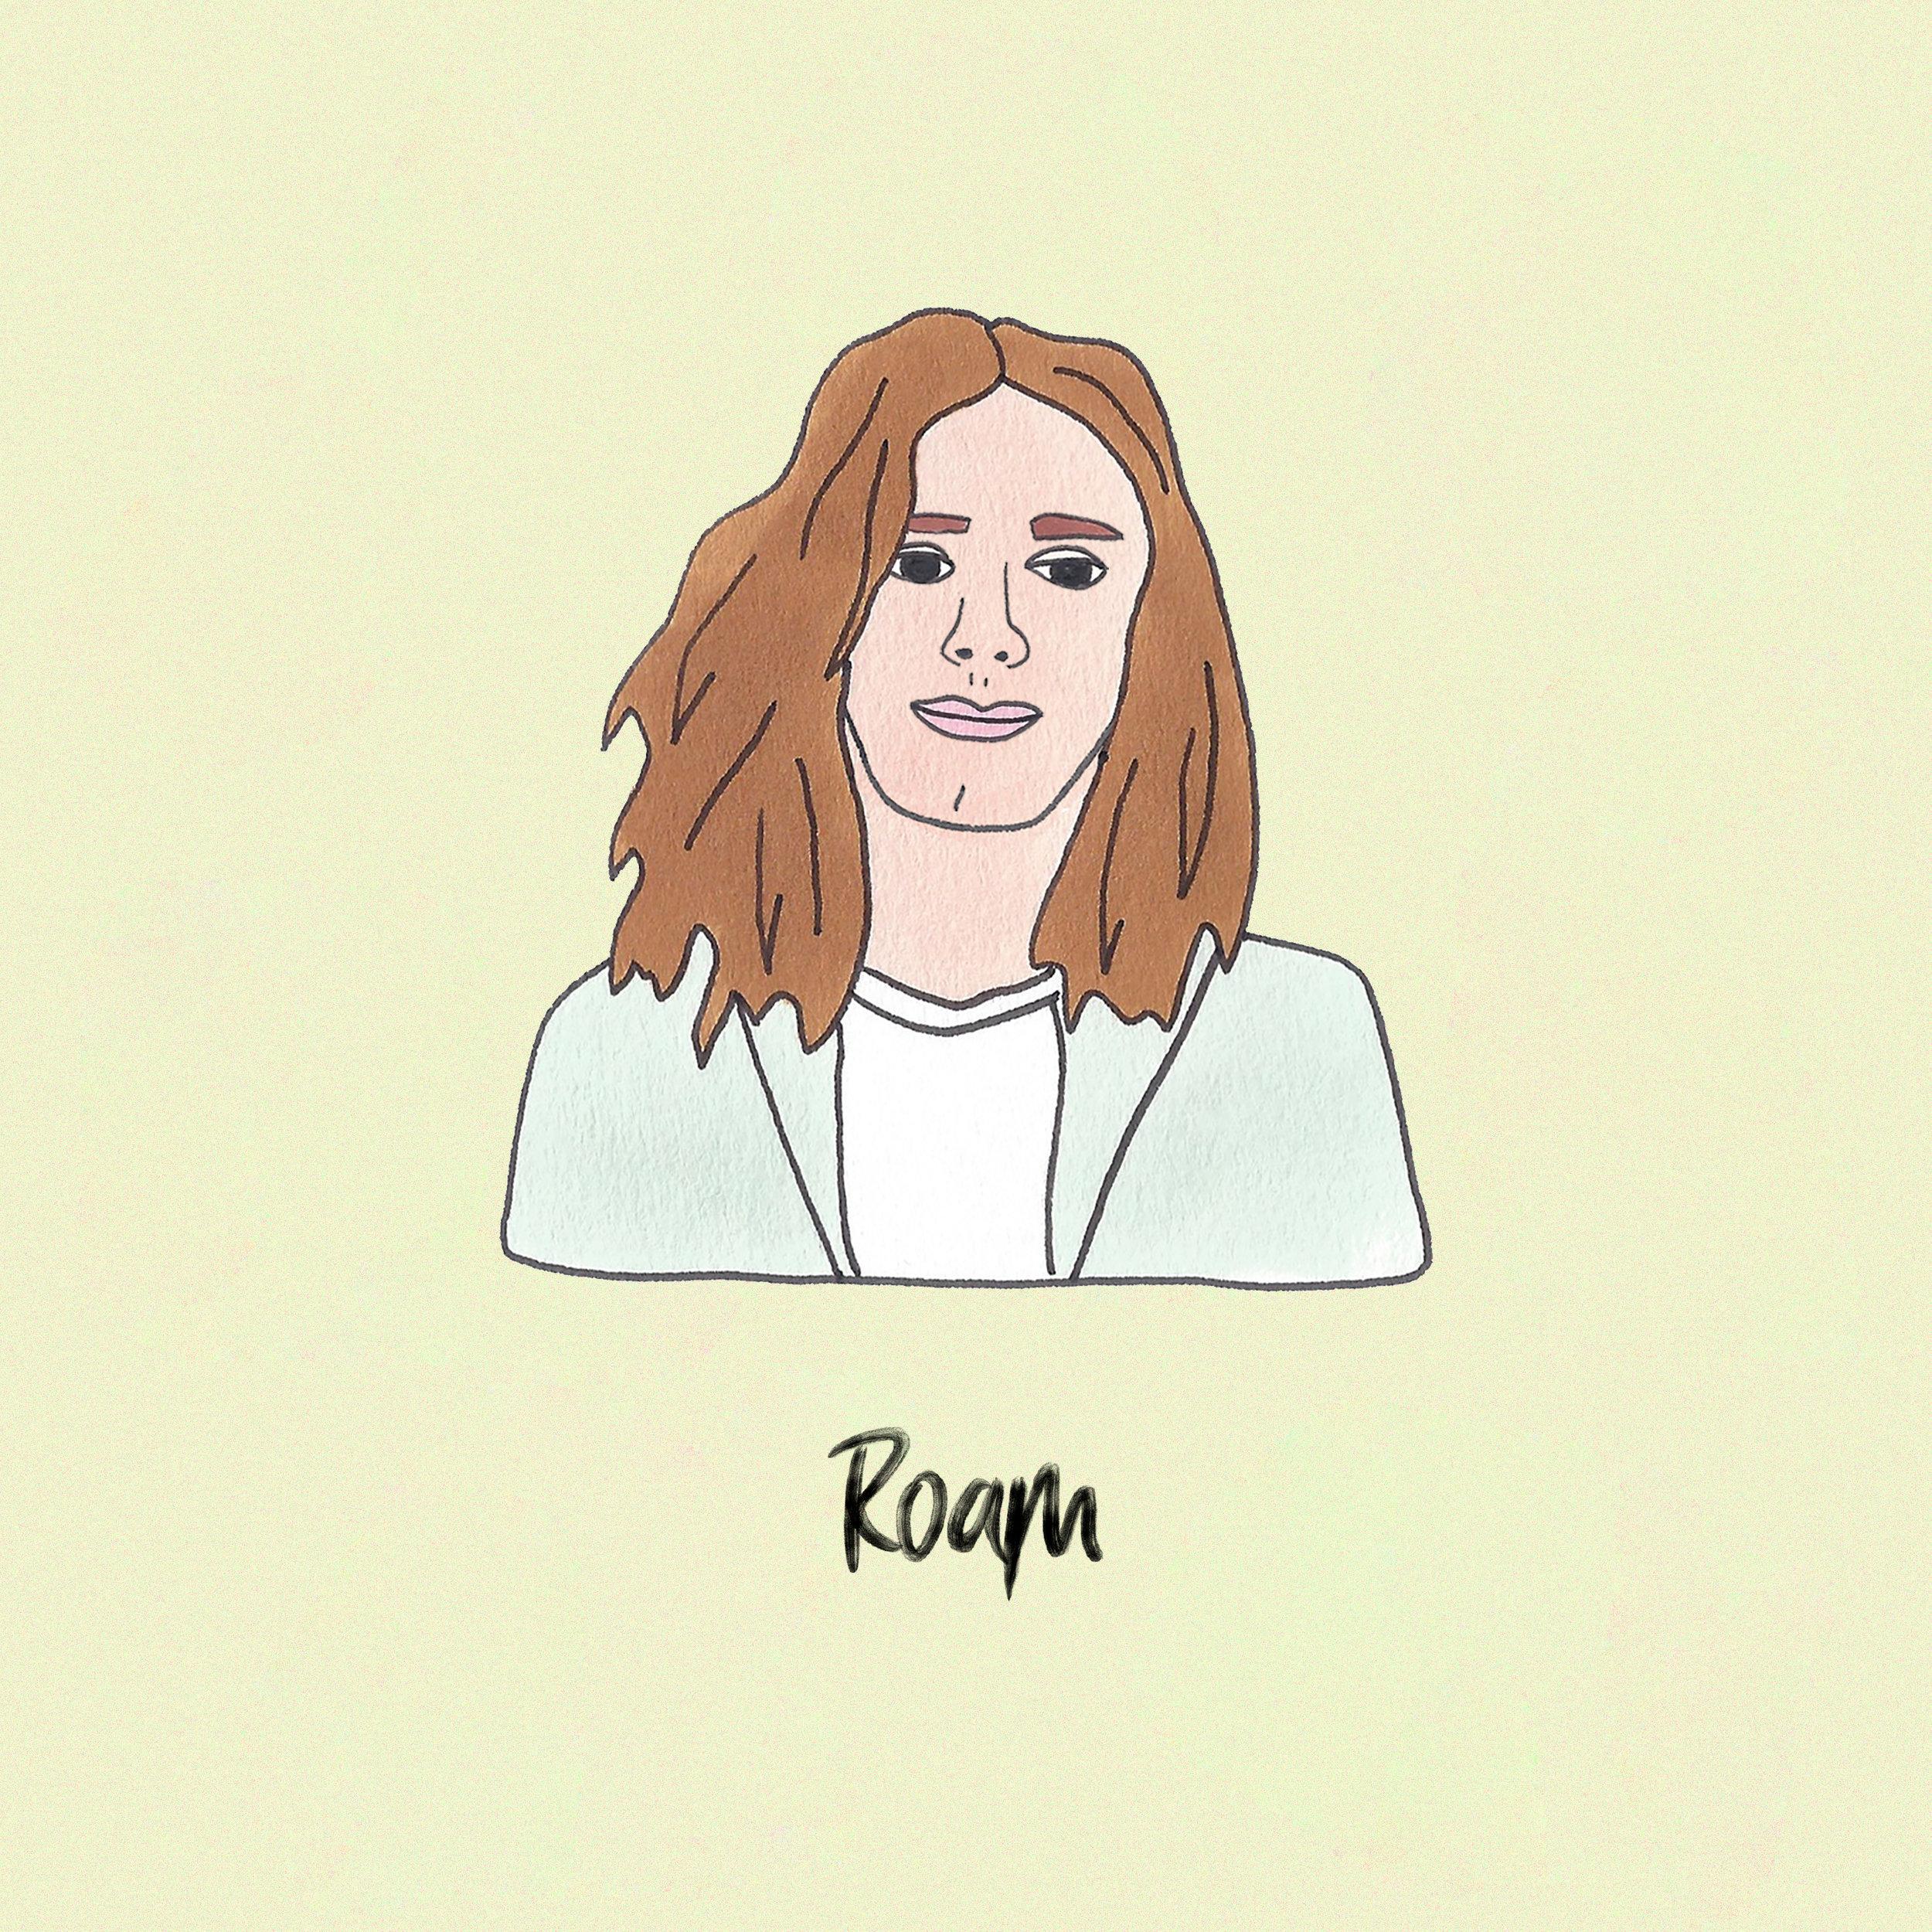 CaseyLowry-Roam.jpg